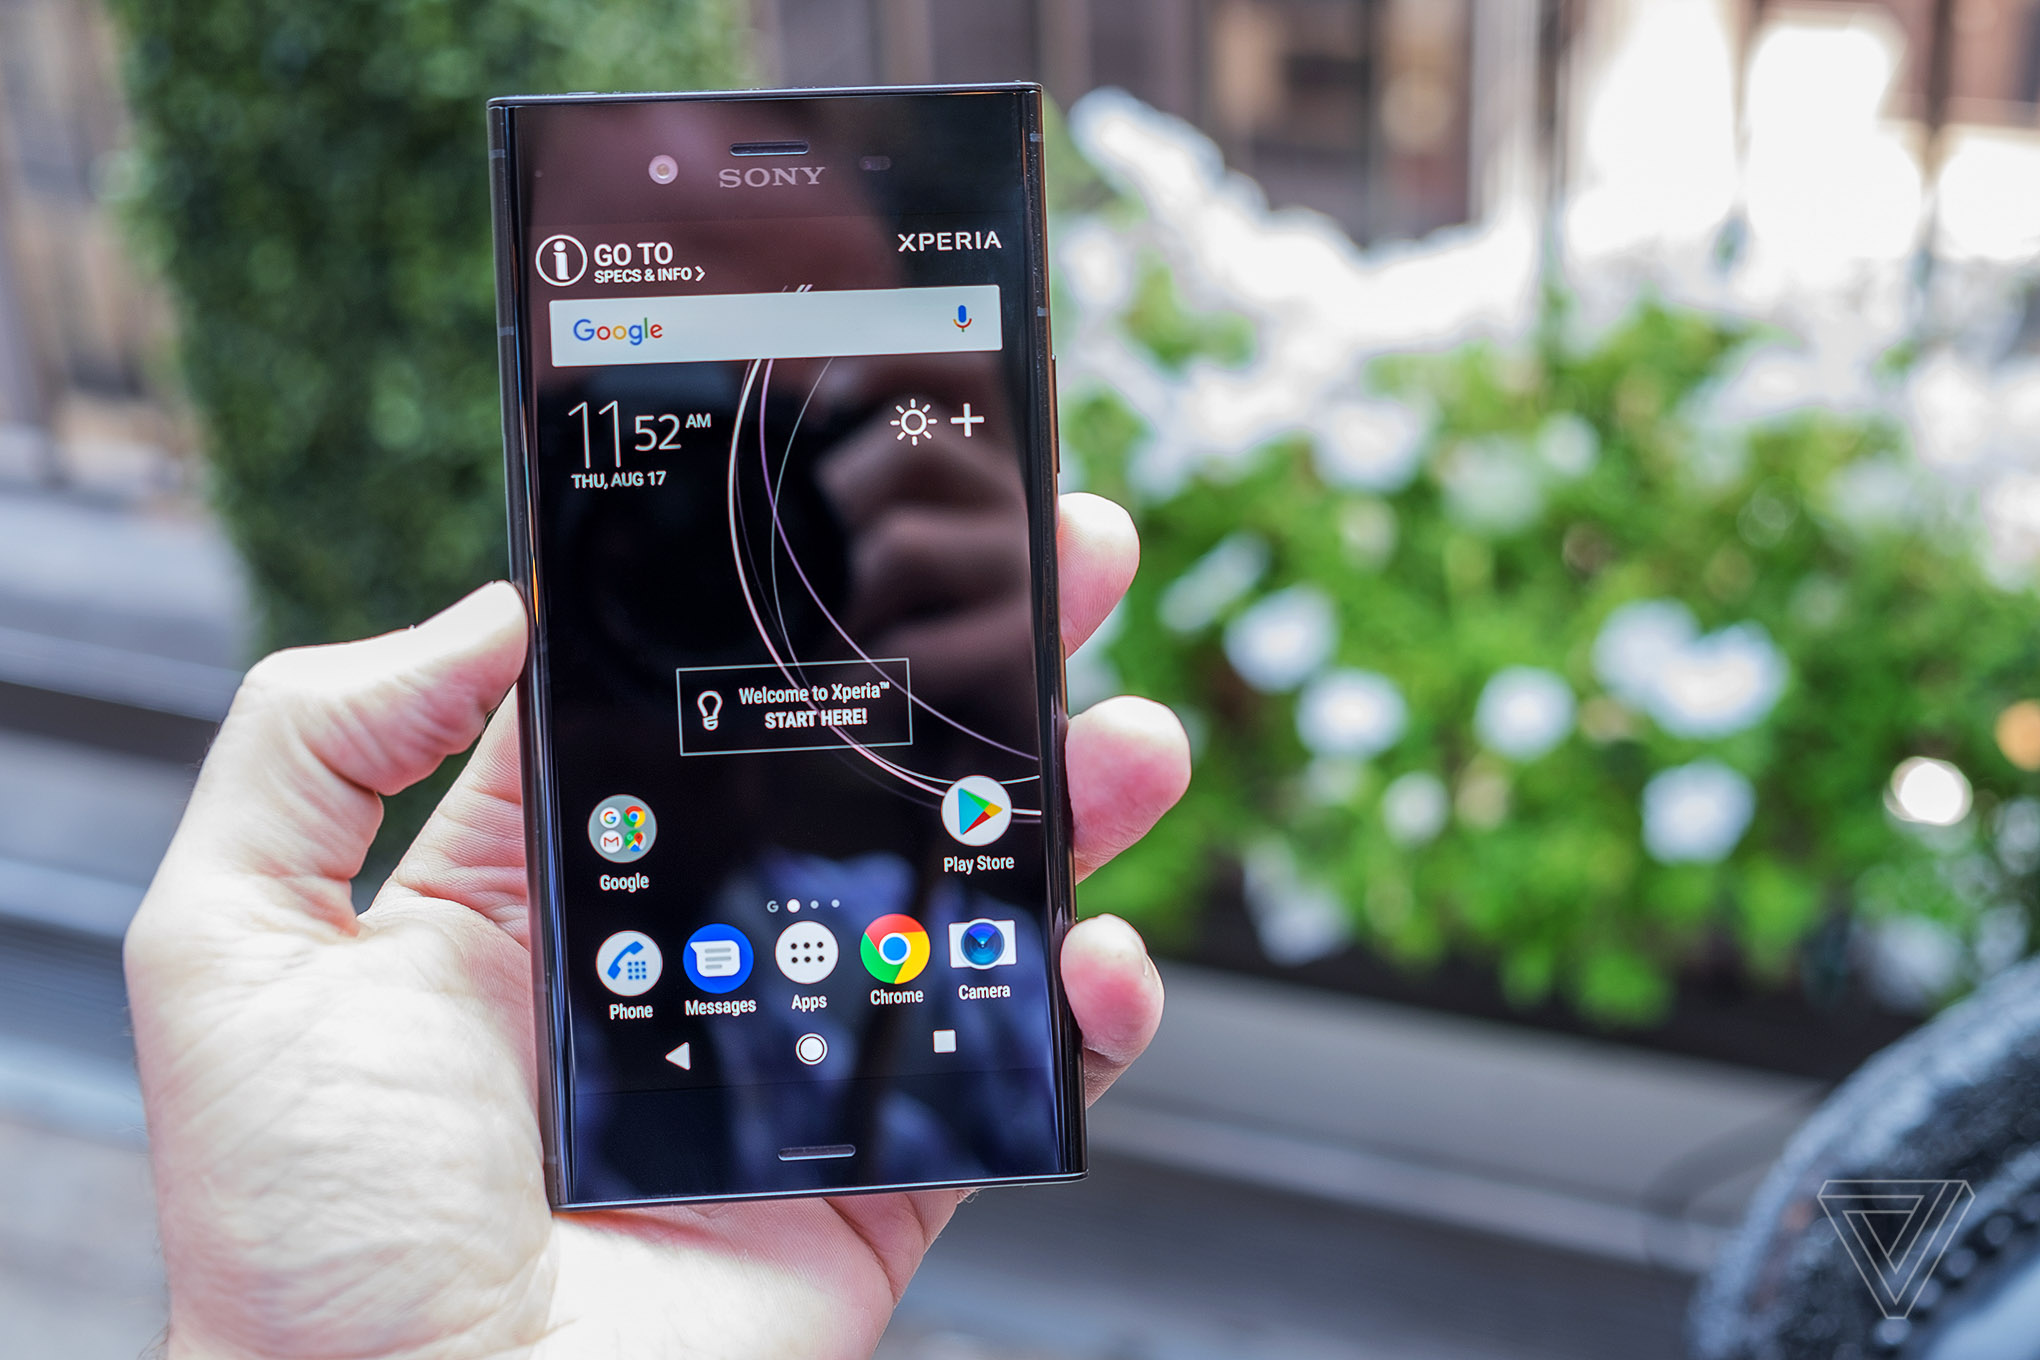 Techmeme: Sony launches $700 Xperia XZ1 and $600 XZ1 Compact